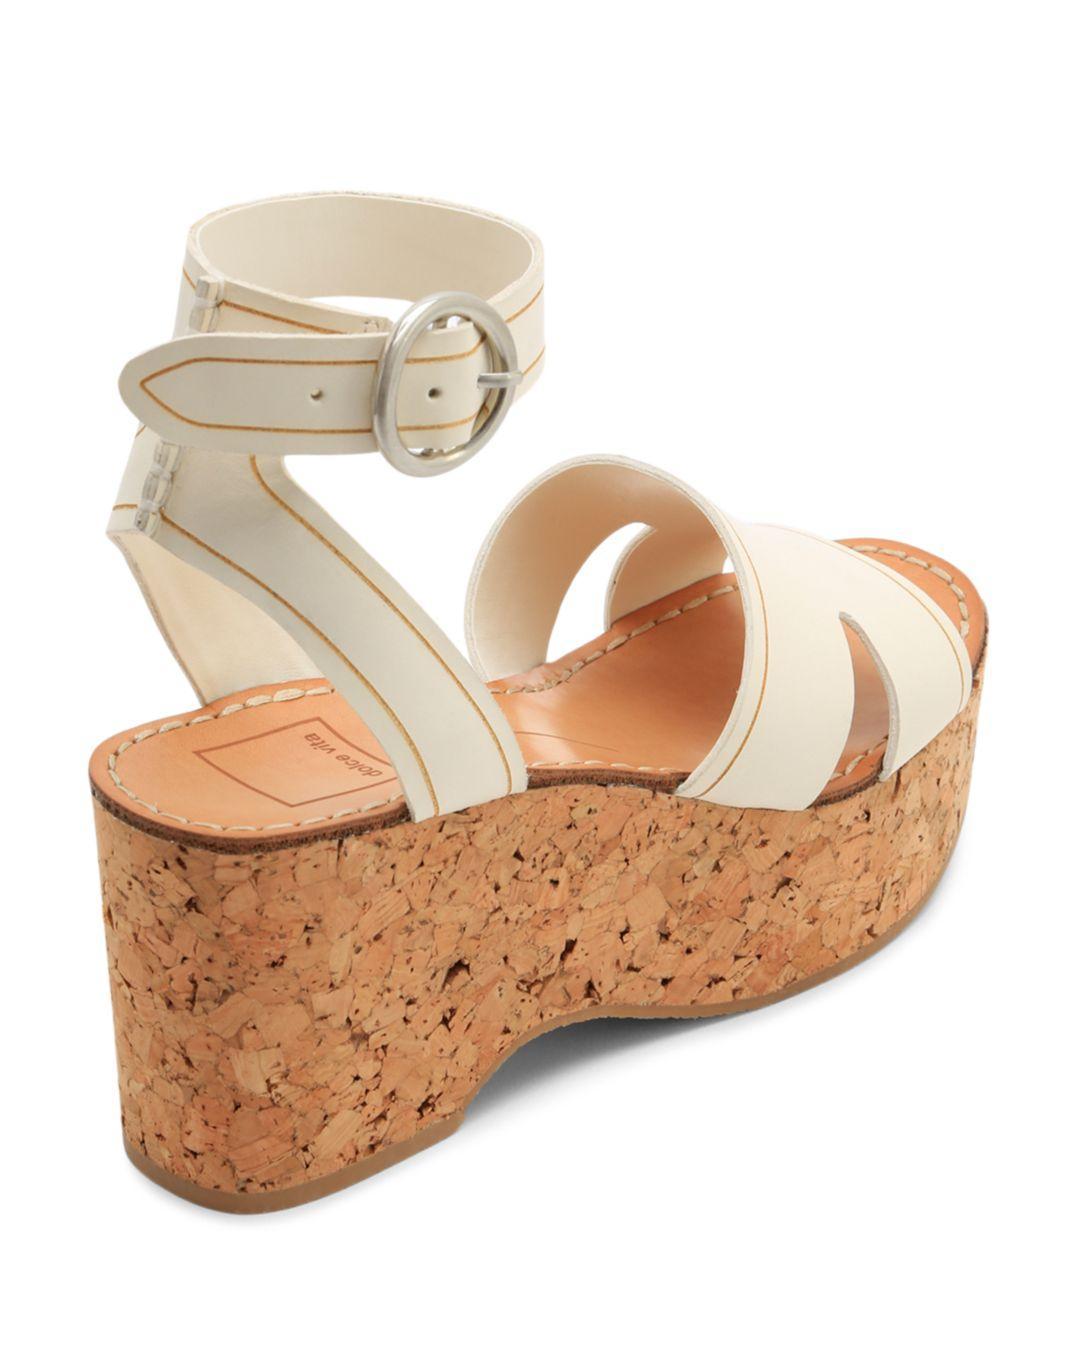 33942c0b5f3c Dolce Vita - White Women s Linda Leather   Cork Platform Sandals - Lyst.  View fullscreen